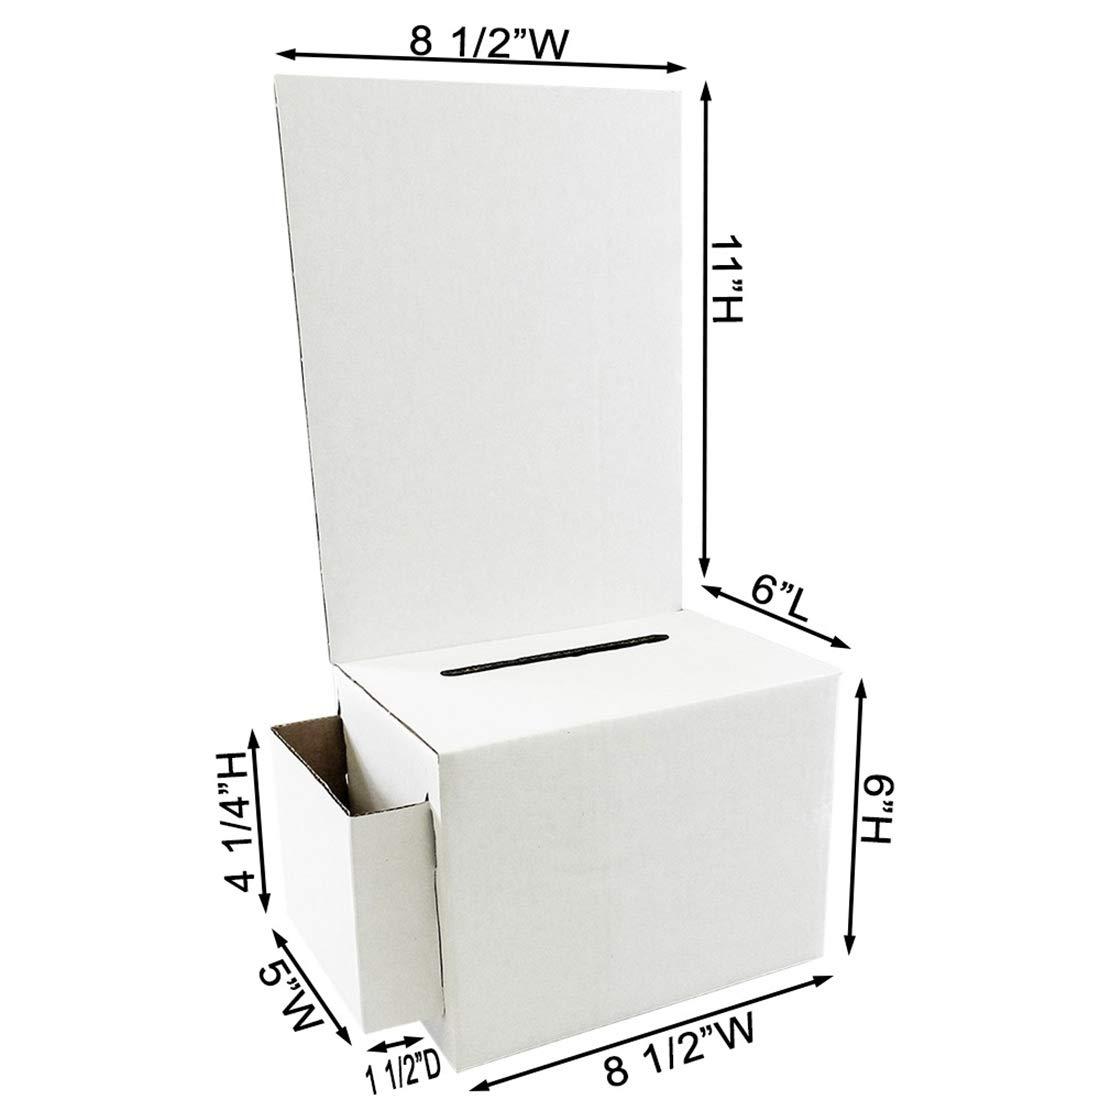 Cardboard Ballot Box with White Removable Header Carton of 10